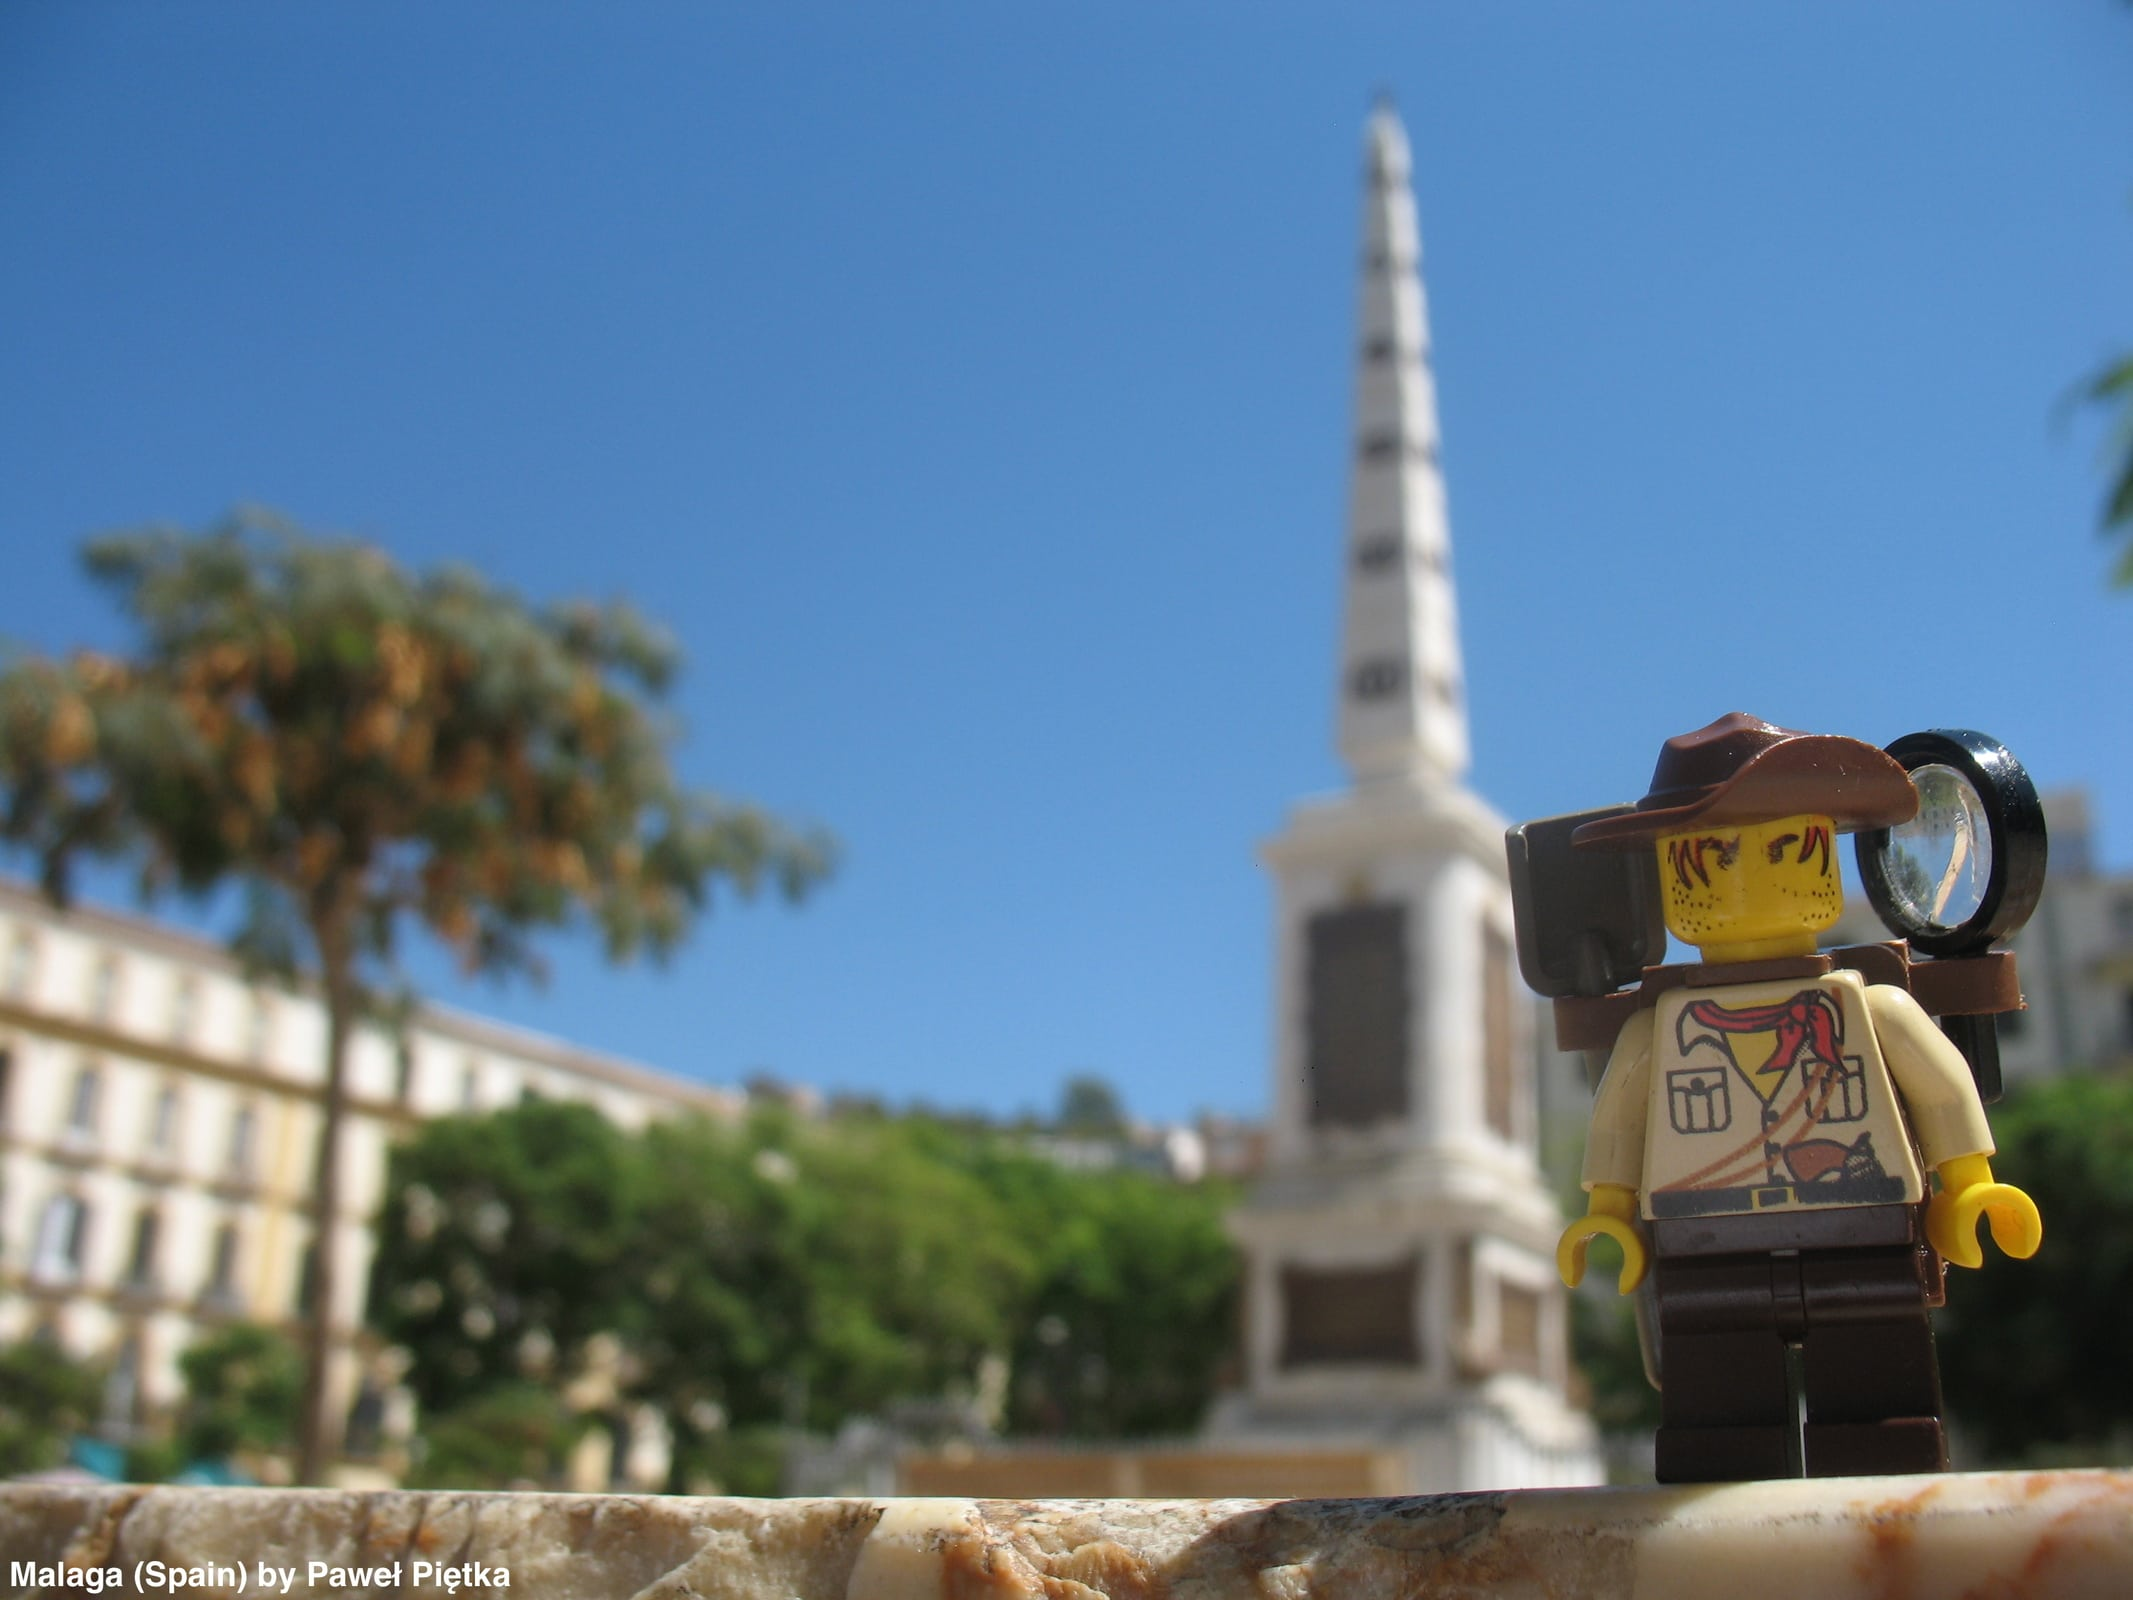 Malaga (Spain) - Plaza de La Merced